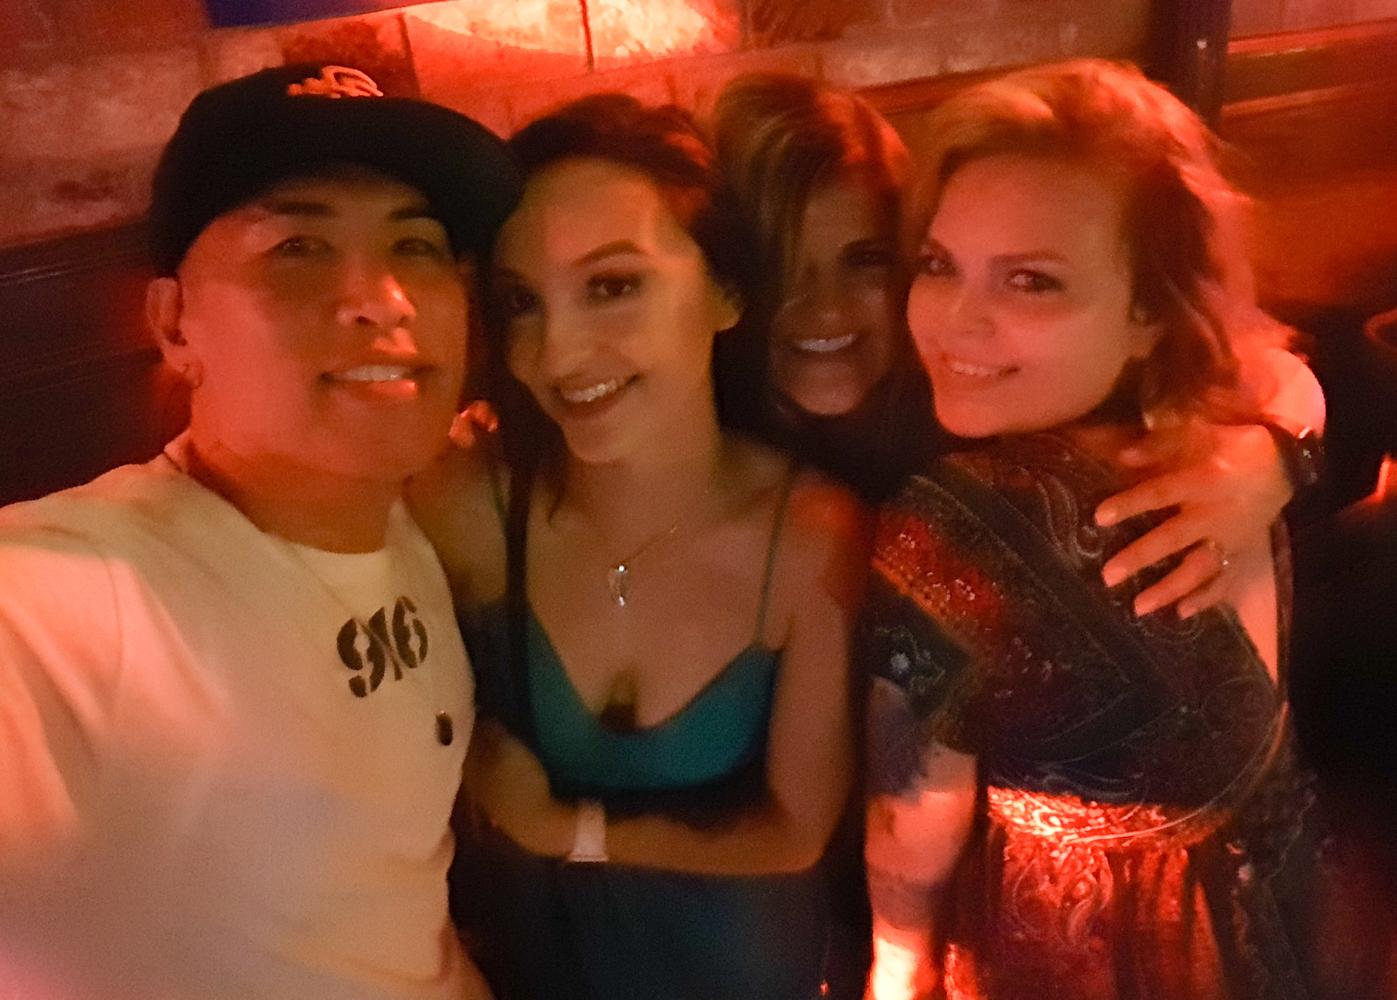 Kayla, Pam, and Kasey